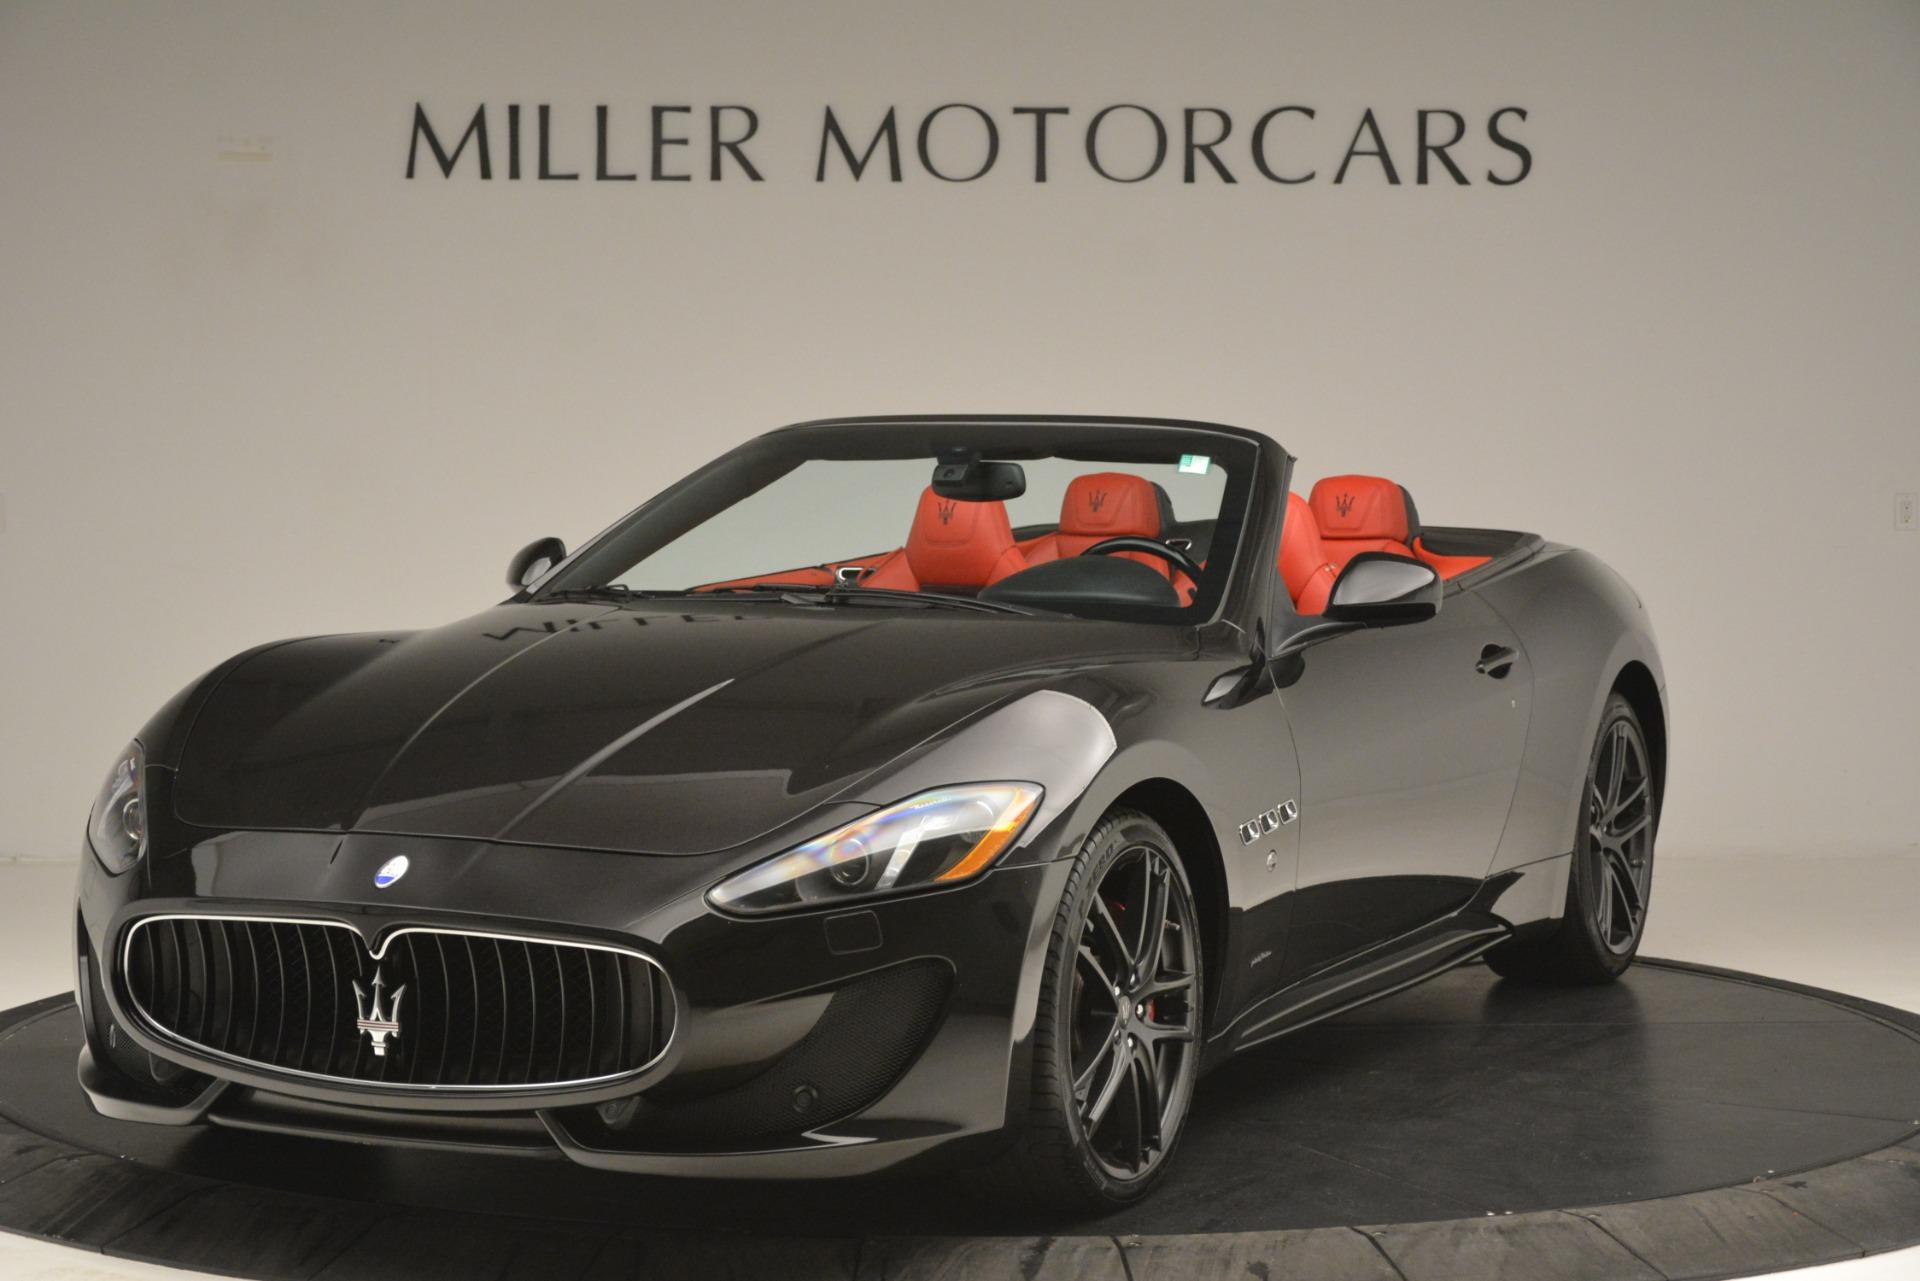 Used 2015 Maserati GranTurismo Sport for sale Sold at McLaren Greenwich in Greenwich CT 06830 1